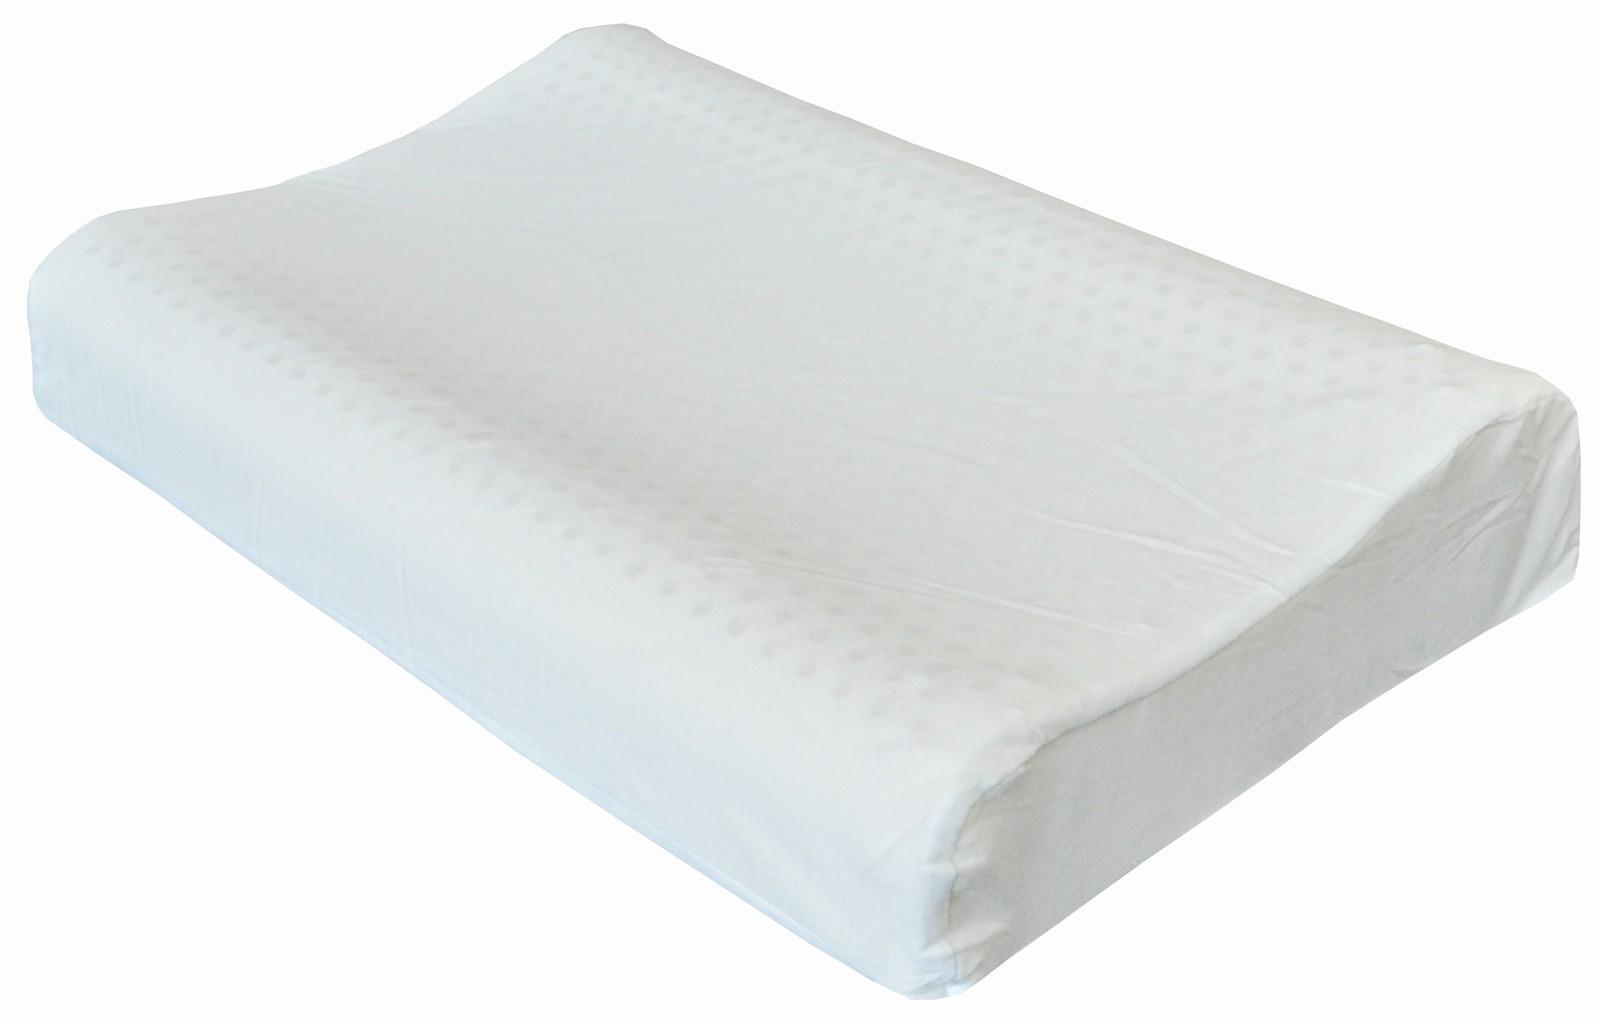 Therapeutically designed contoured latex pillows 60 x 40 10/12 cm